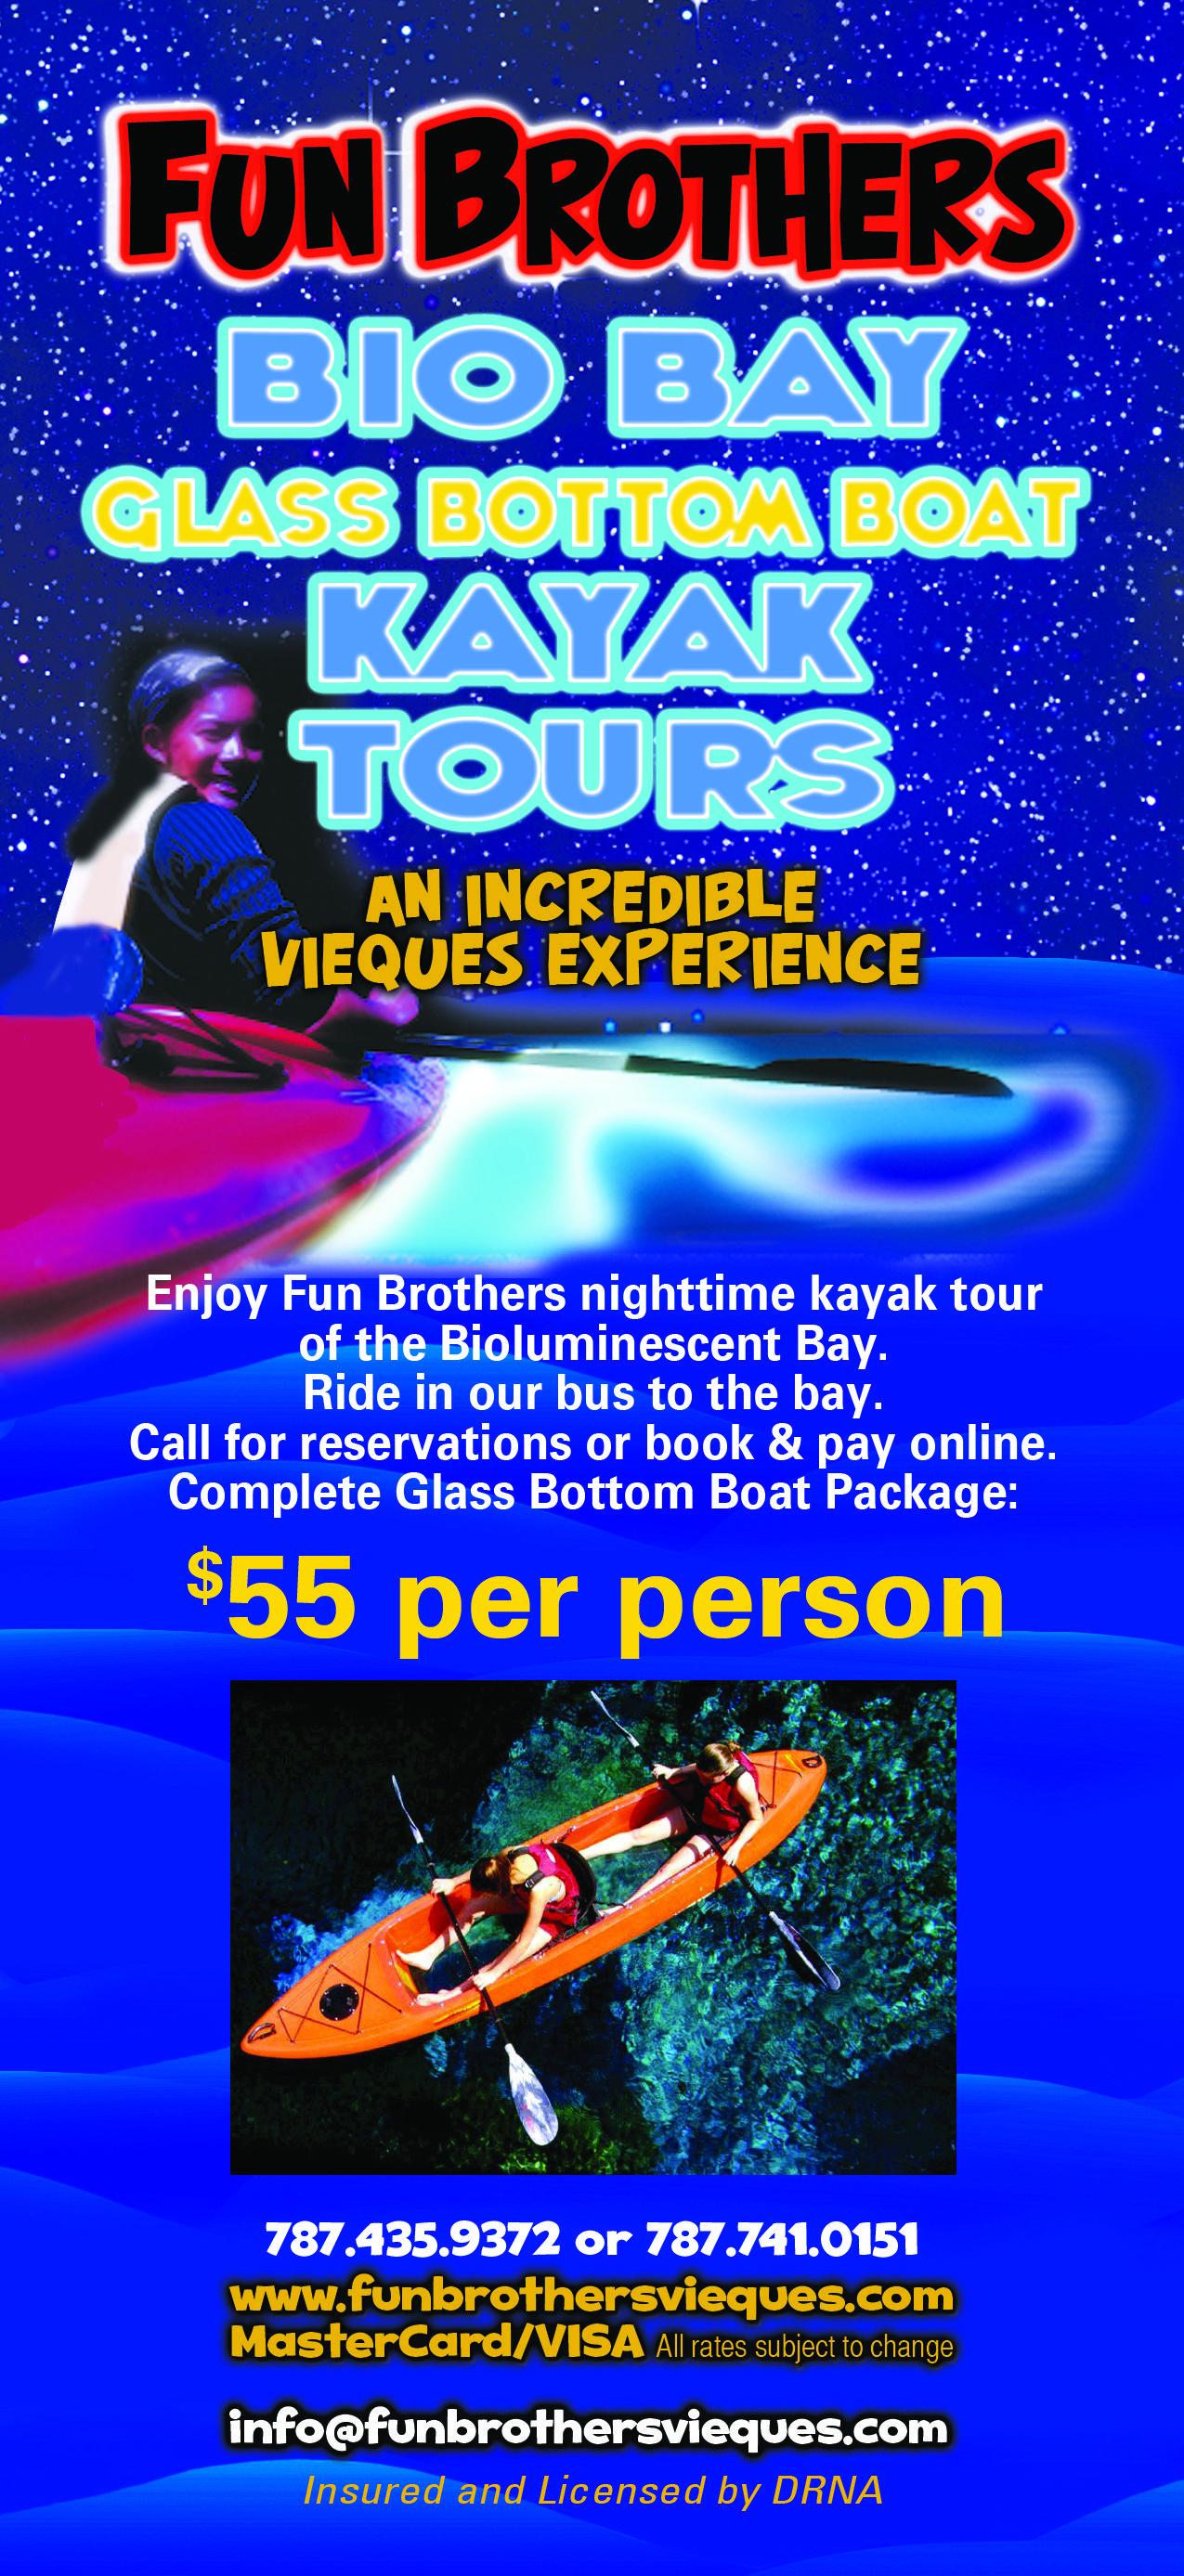 Fun Brothers Kayak Tours Glass Bottom Boat Fun